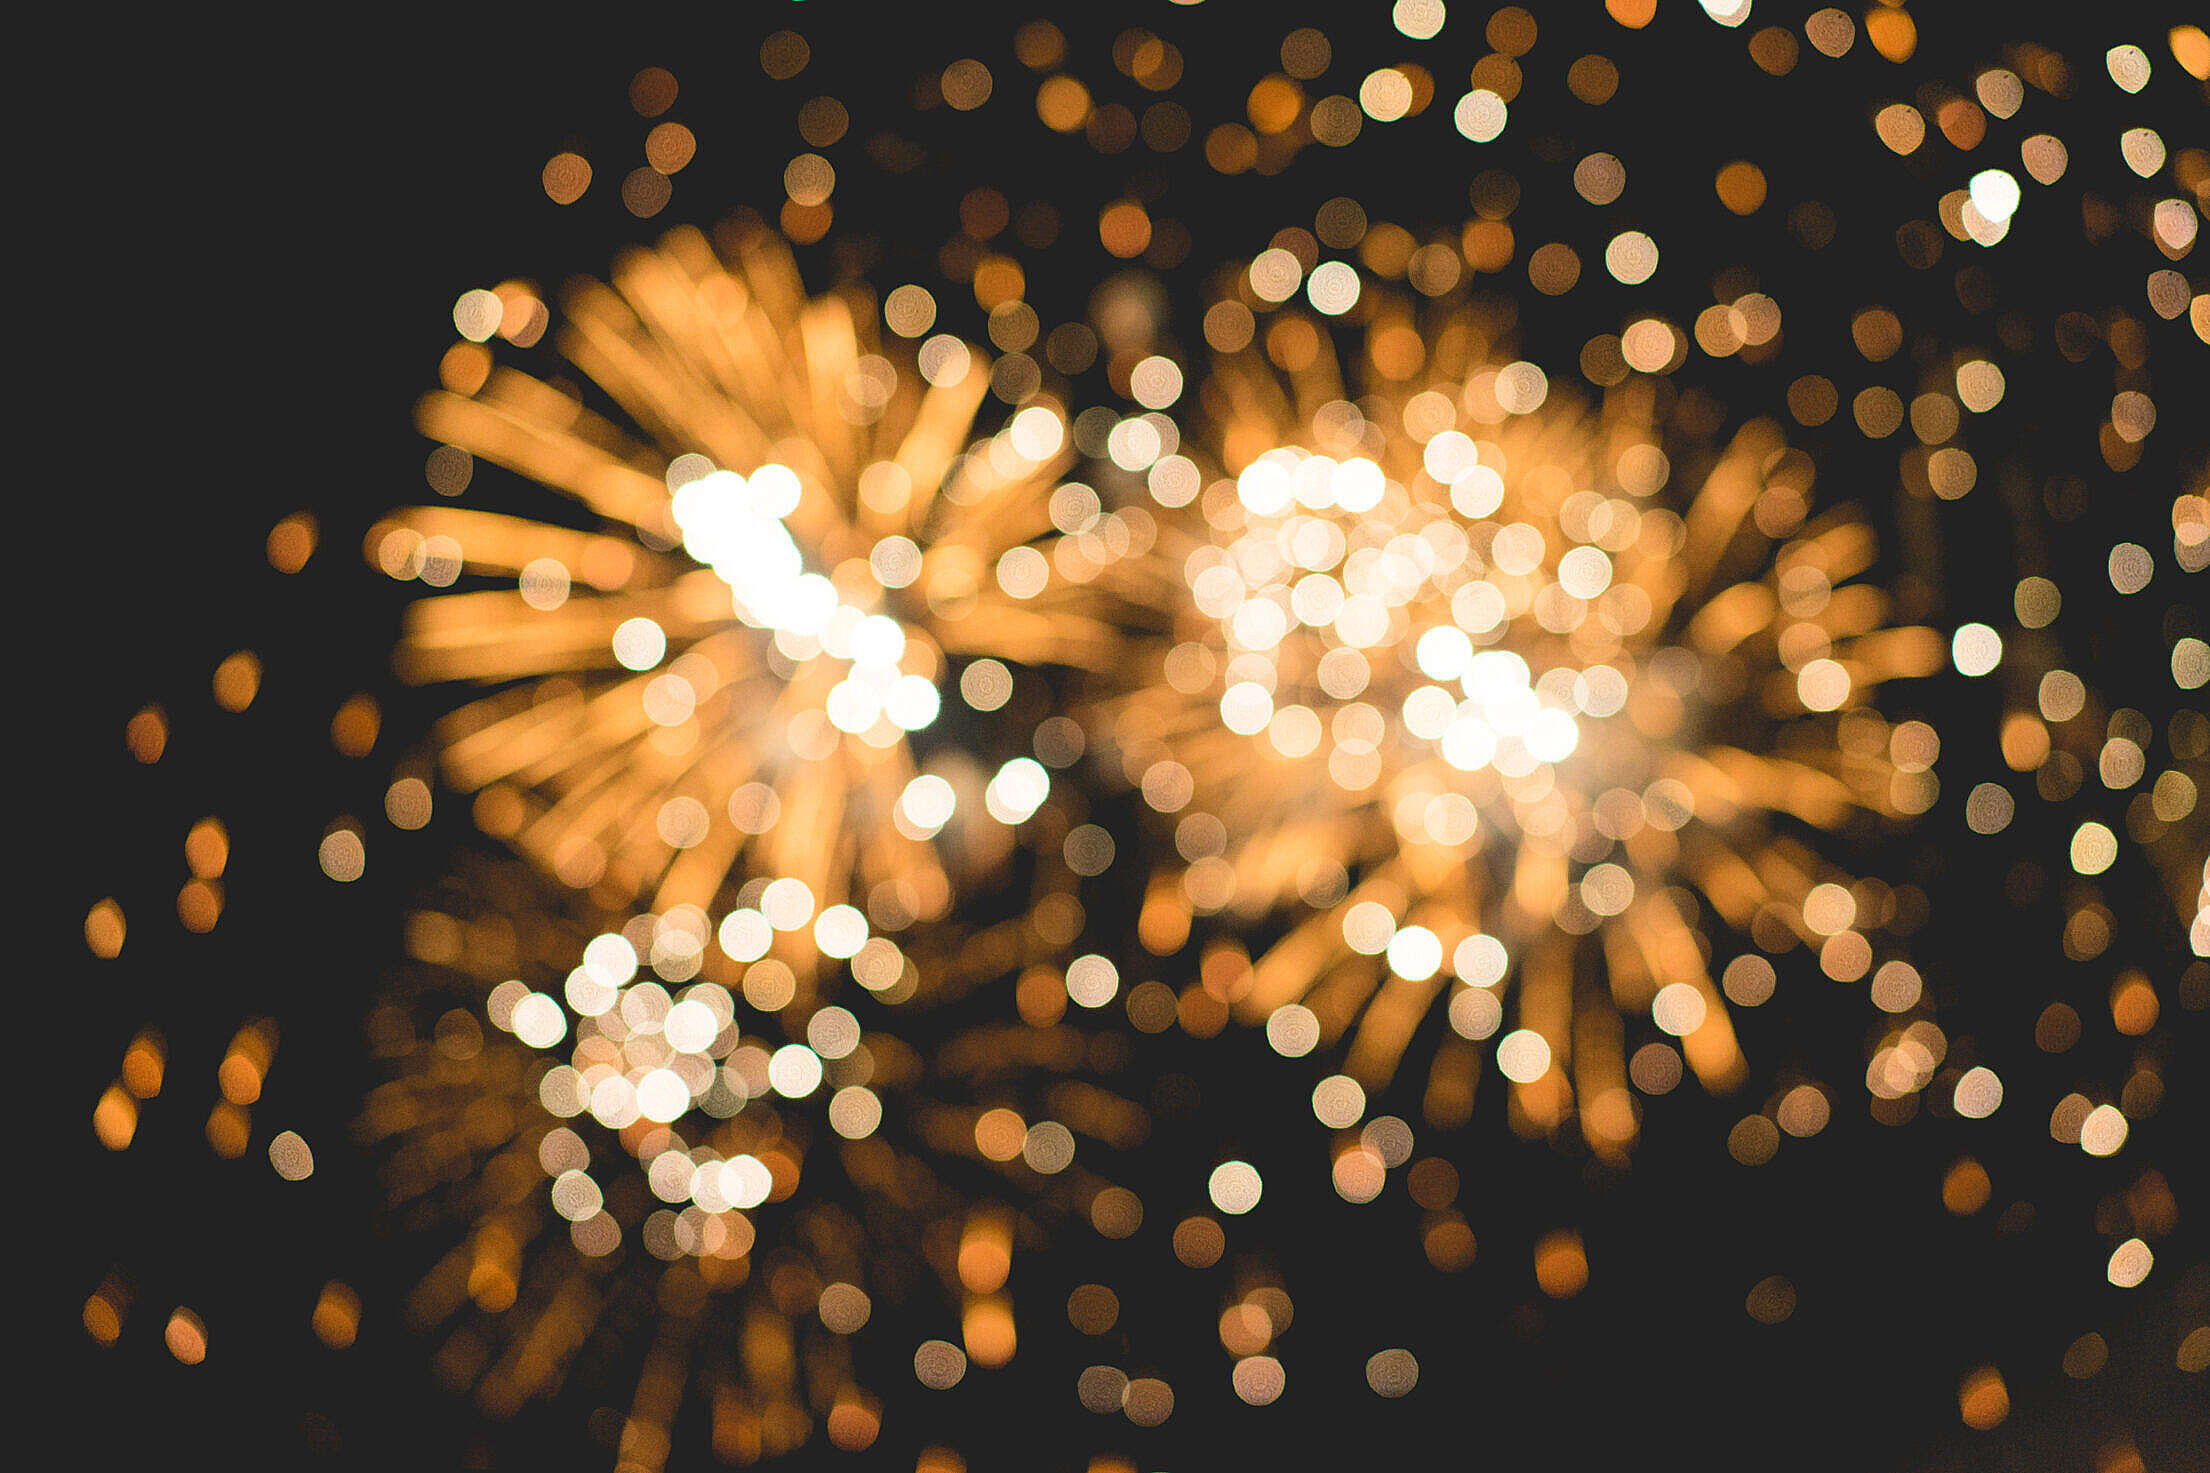 Bokeh Classy Golden Fireworks Lights Background Free Stock Photo